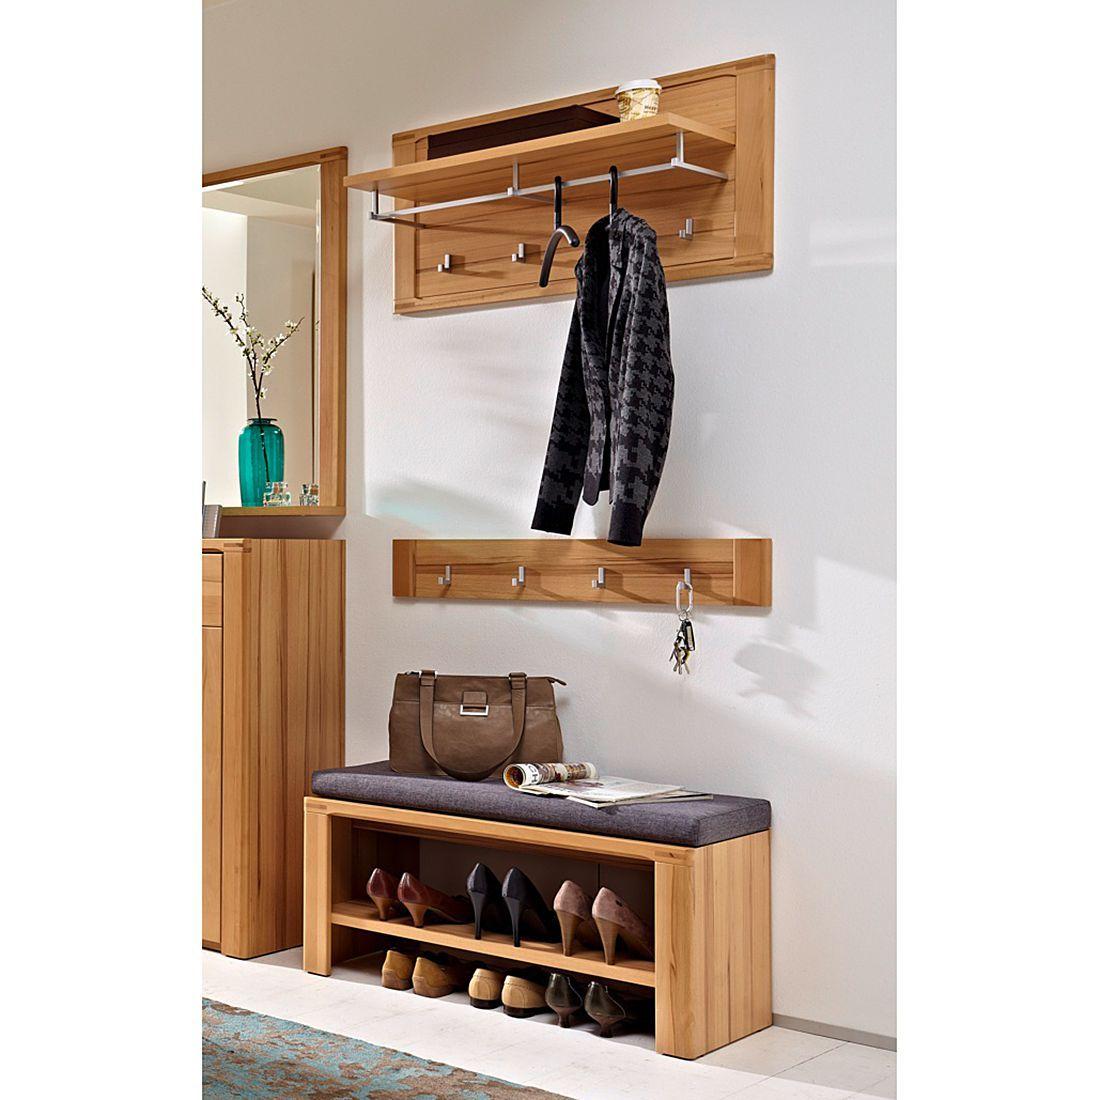 Garderobenset Naturestar 3 Teilig Garderobenset Garderoben Set